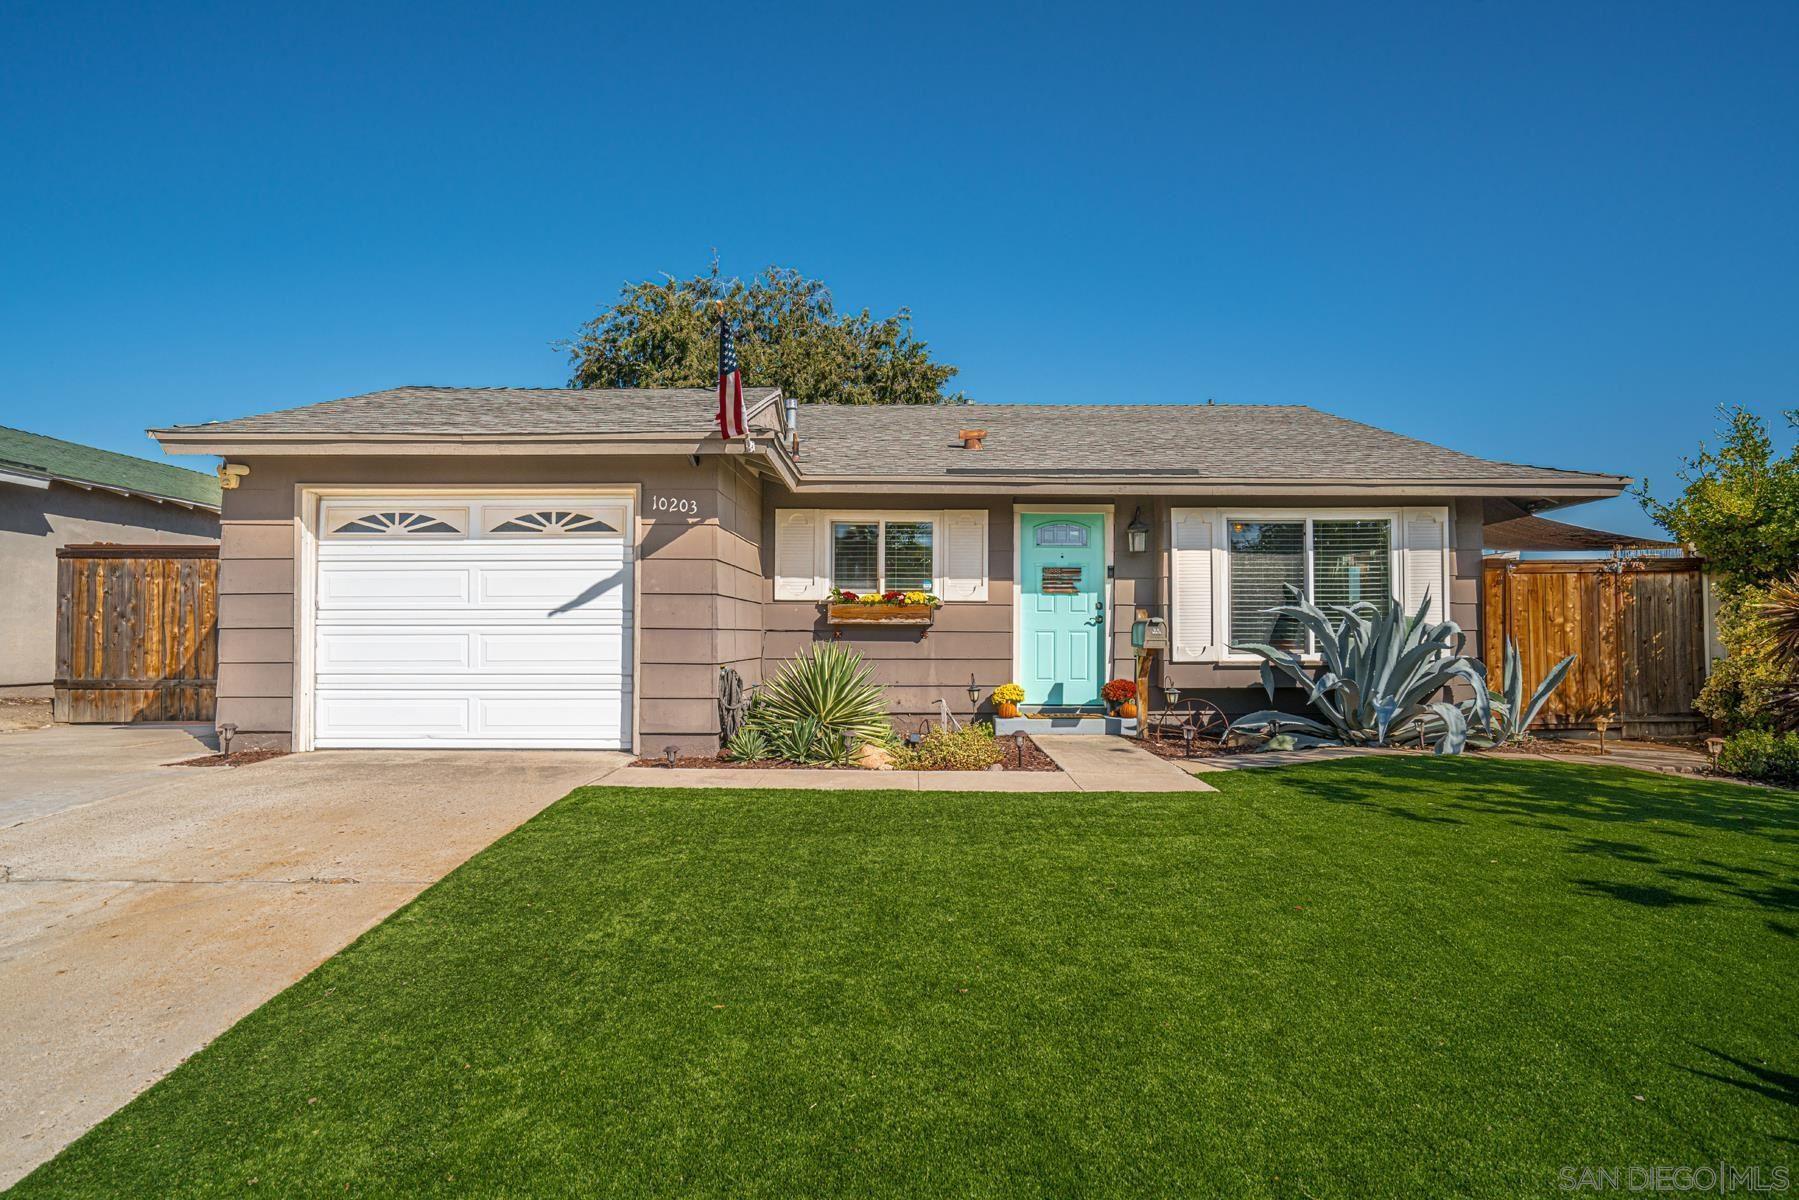 Photo of 10203 Woodrose Avenue, Santee, CA 92071 (MLS # 210028814)